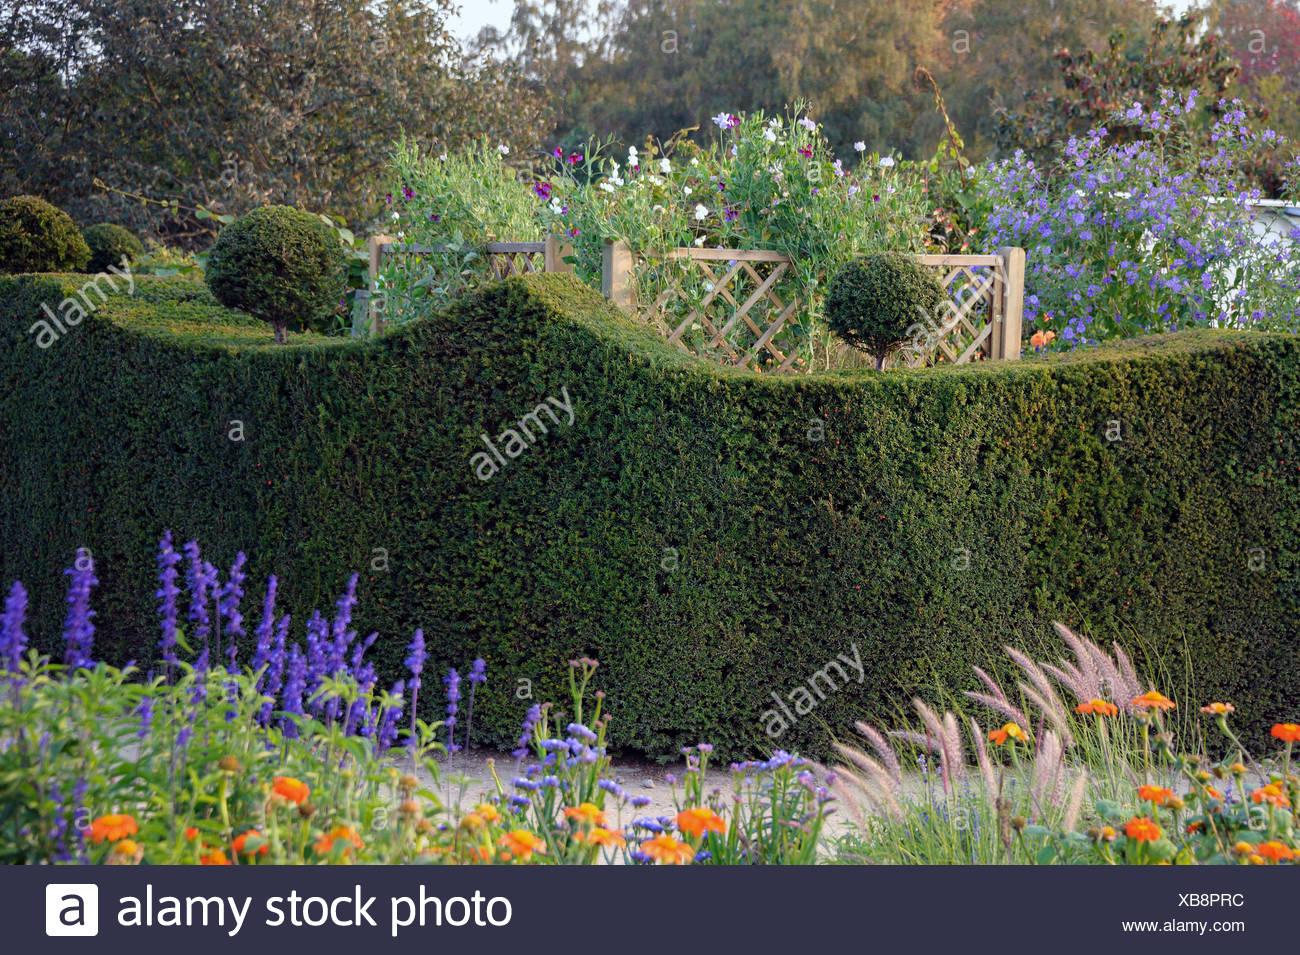 common yew (Taxus baccata), yew hedge, Germany - Stock Image